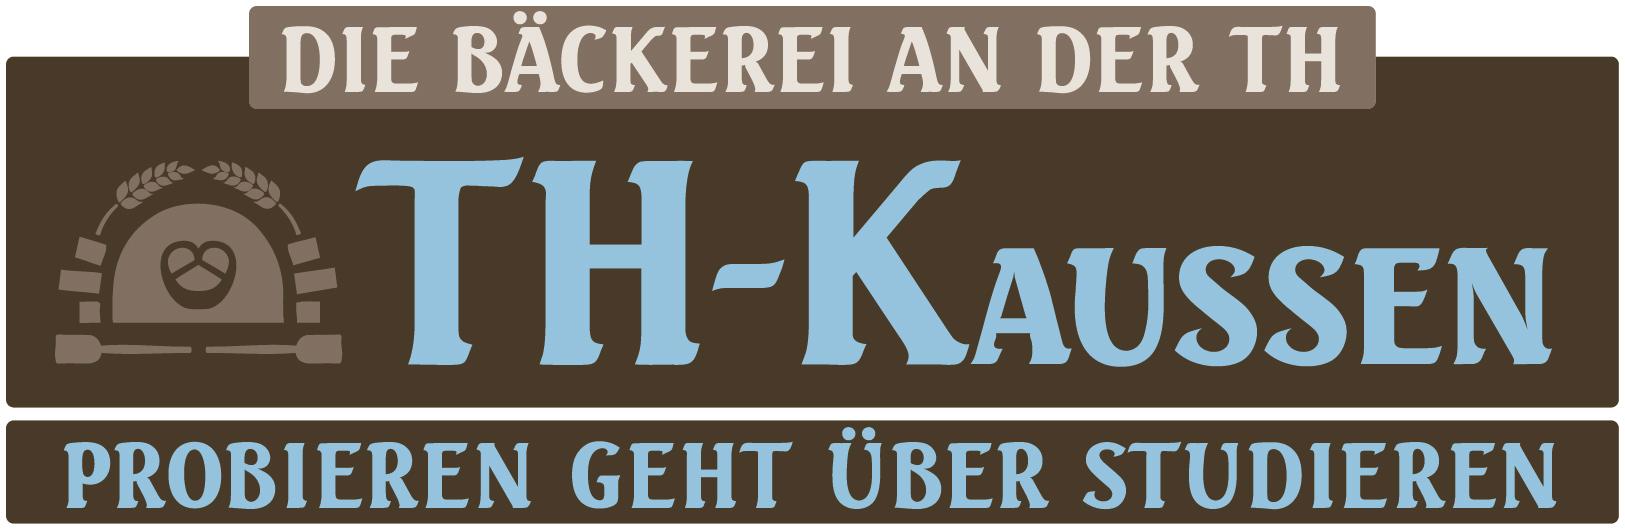 Bäckerei Wilhelm Kaussen